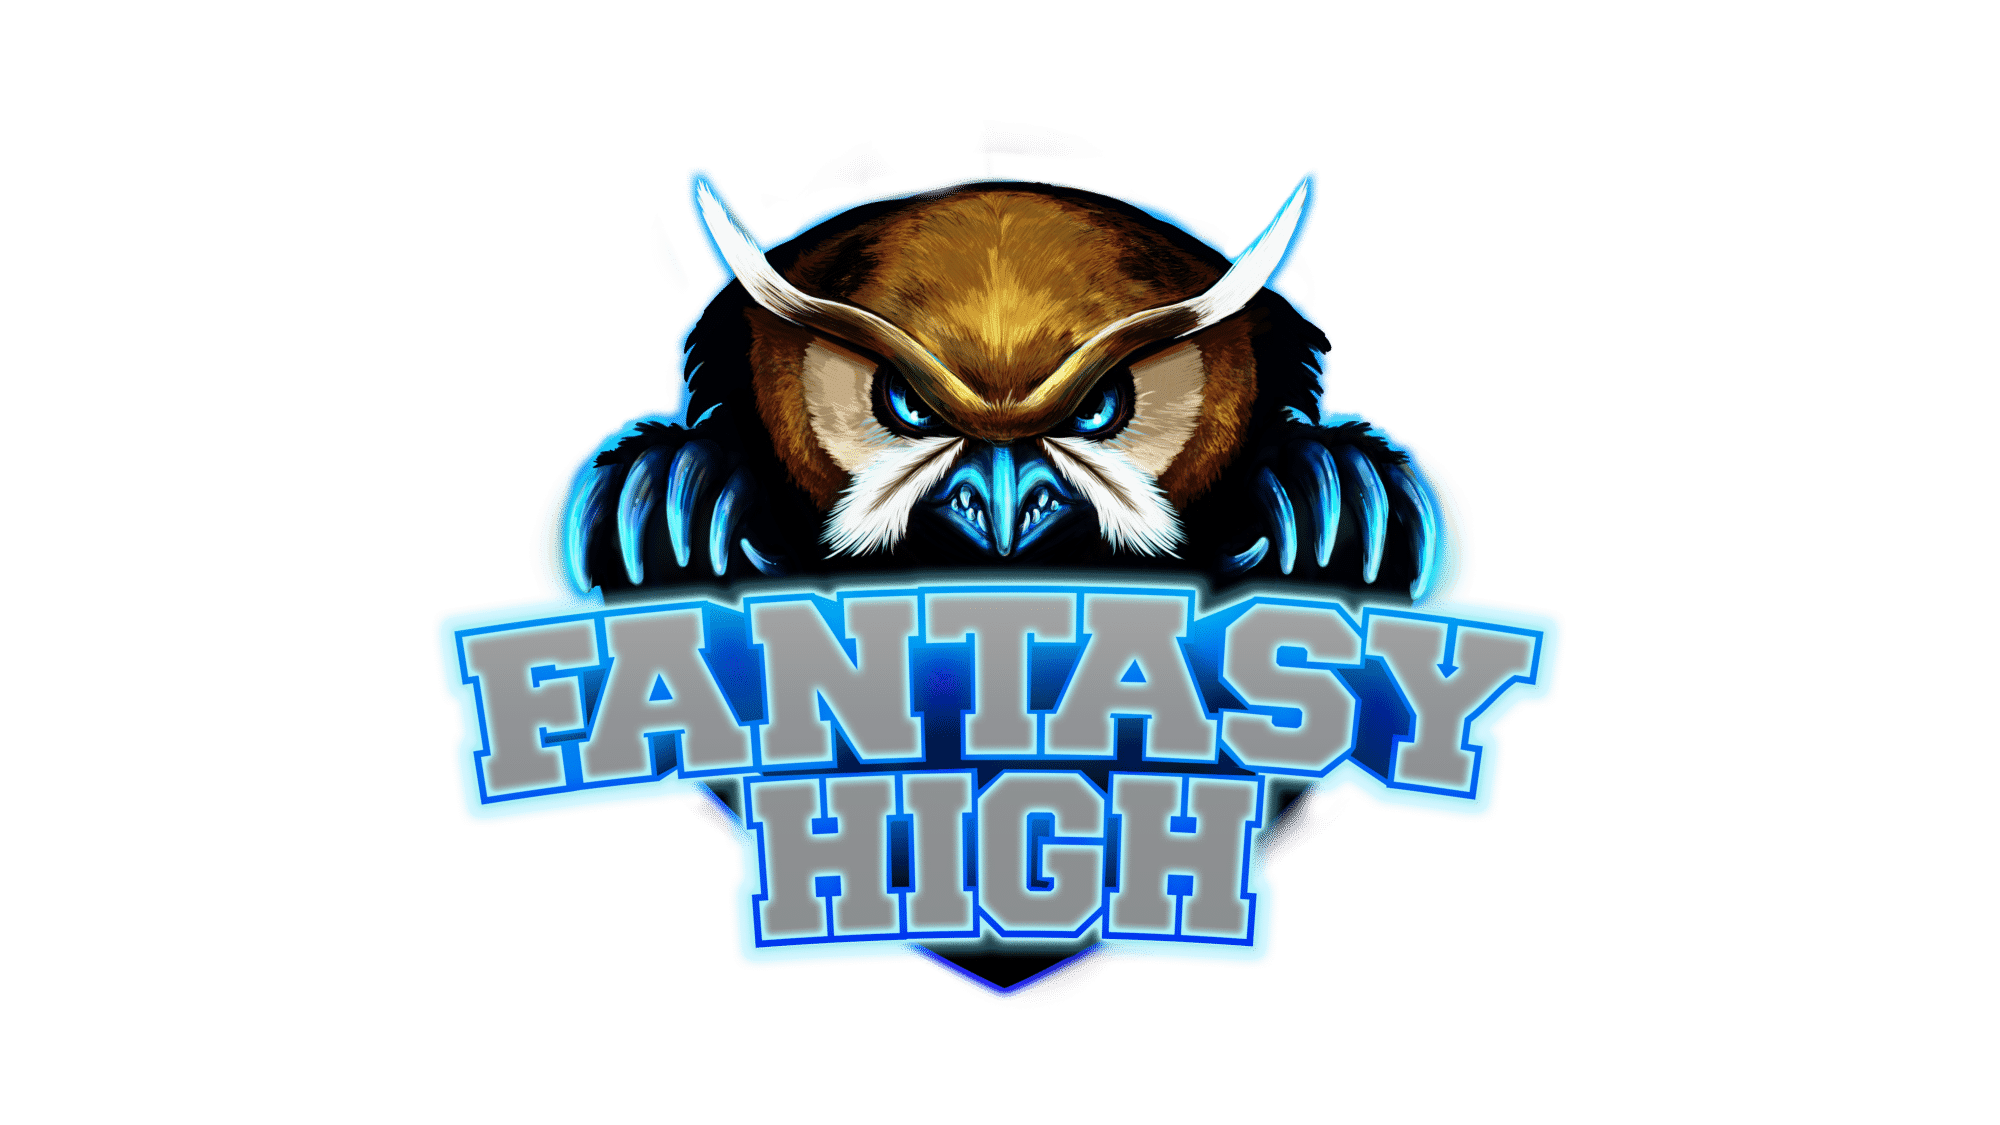 INTERVIEW: CollegeHumor's Dimension 20: Fantasy High